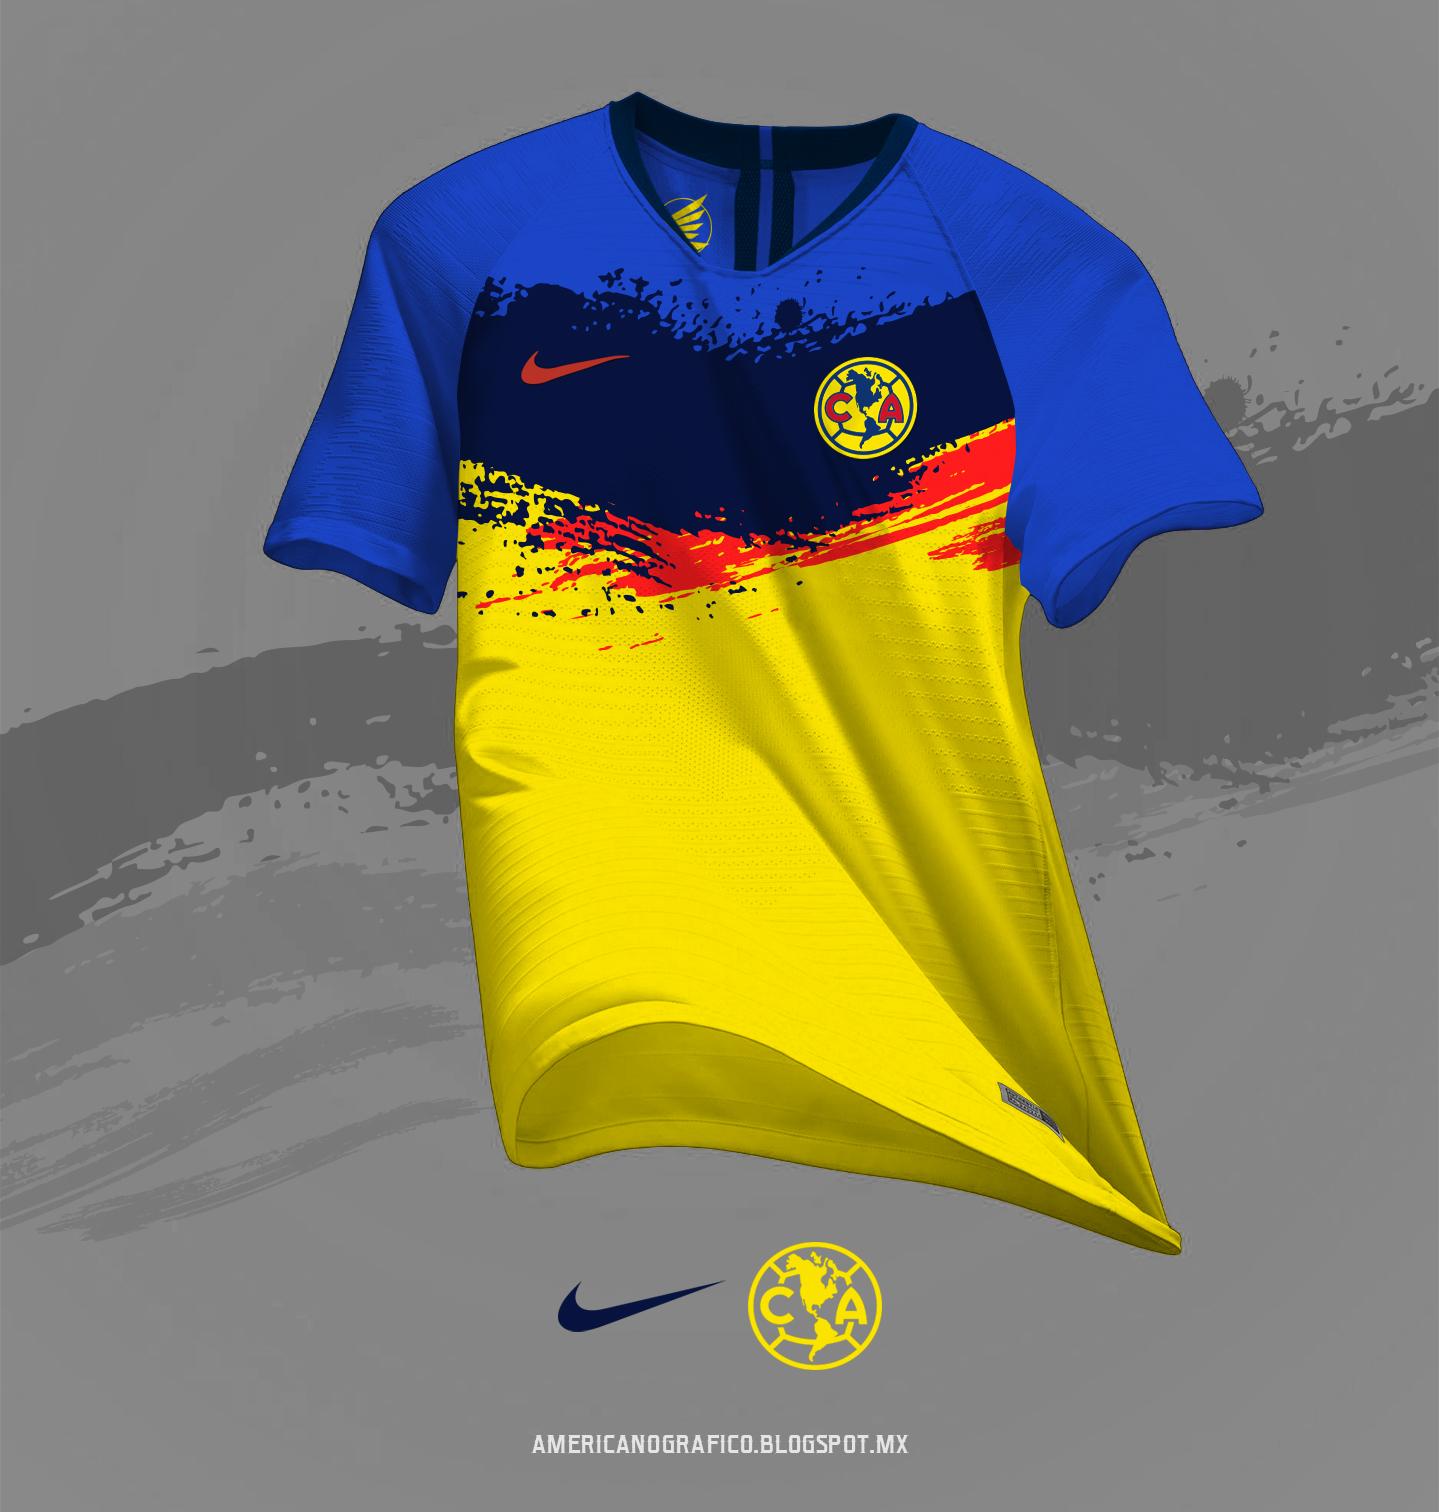 huge discount bacf7 ce090 AMERICAnografico: Jersey Club América #Nike Mod.220818